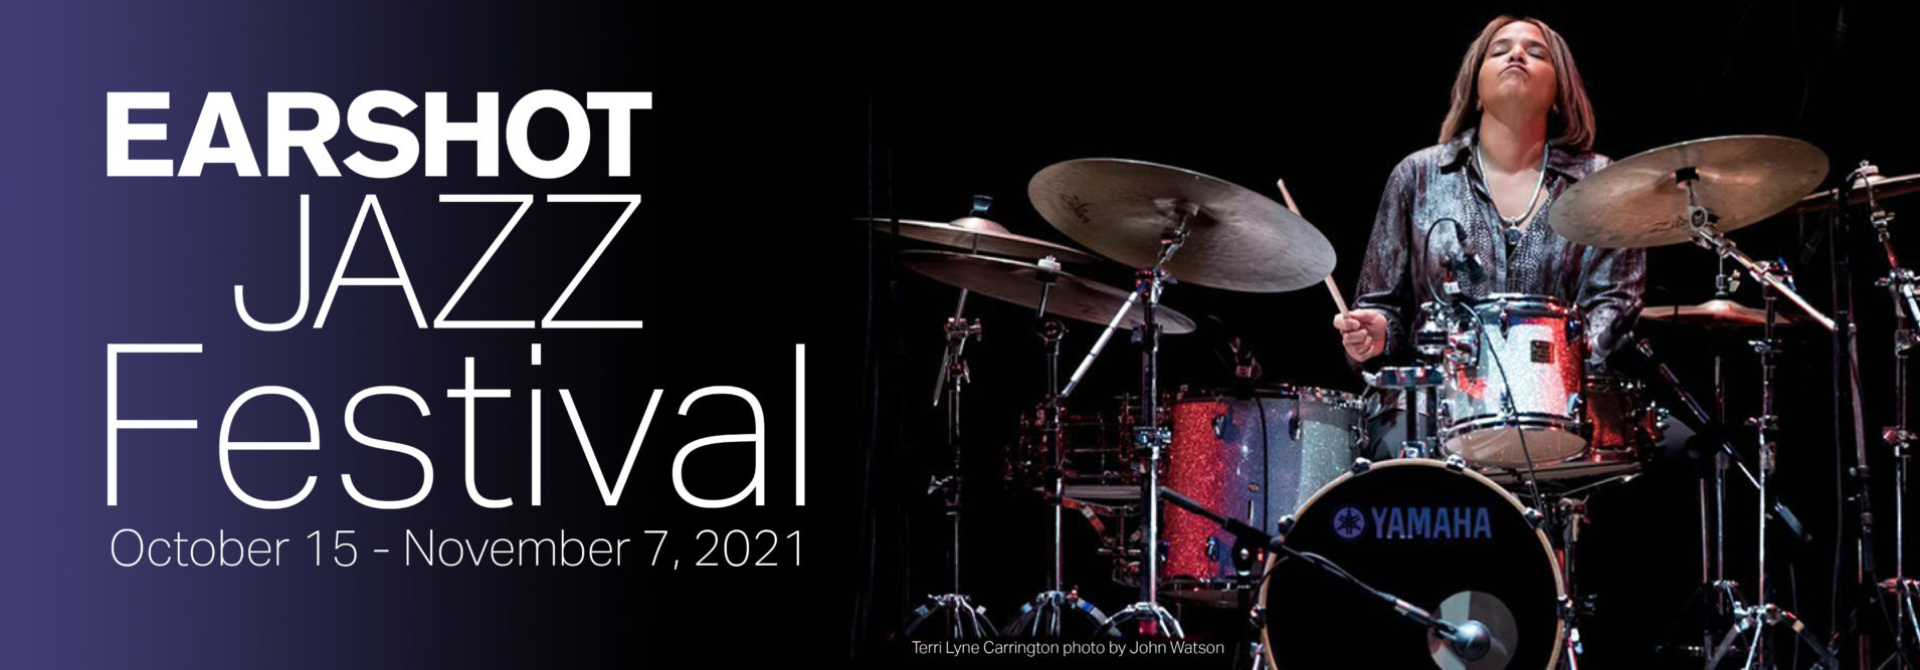 earshot jazz festival terri lyne carrington seattle jazz 2021